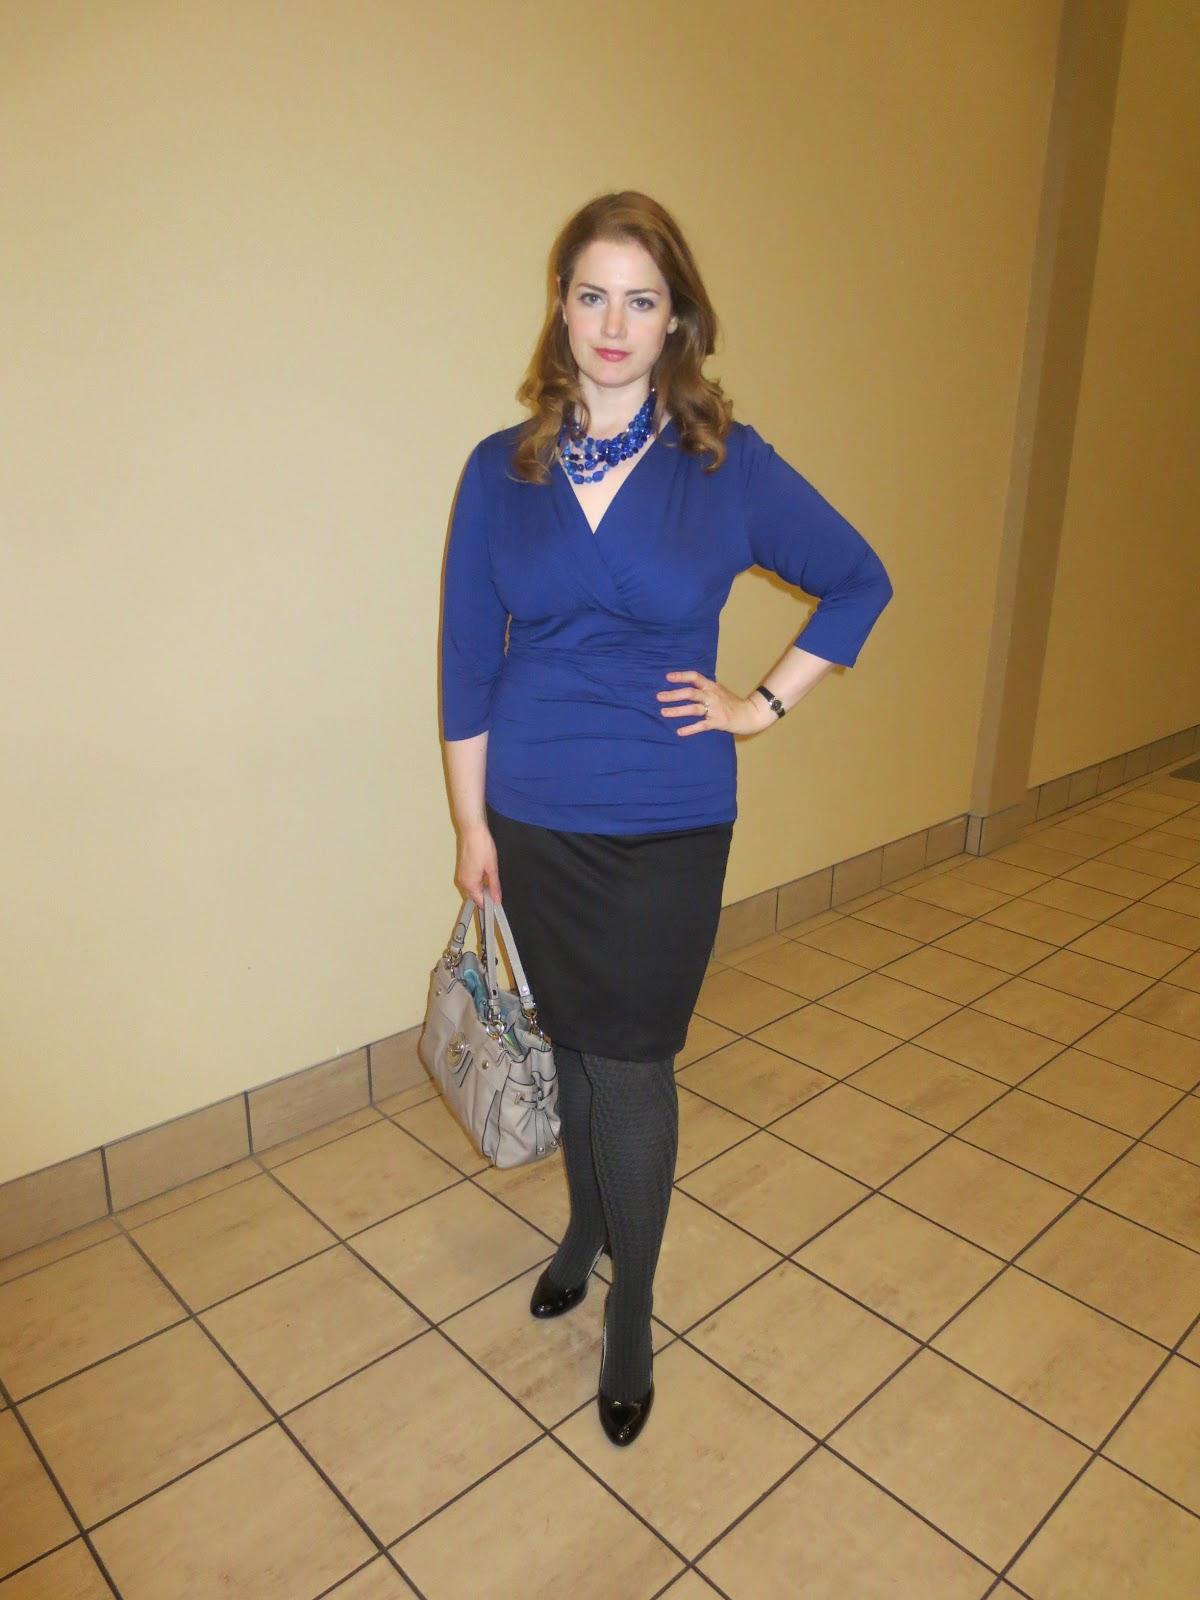 Fashion Tights Skirt Dress Heels January 2013